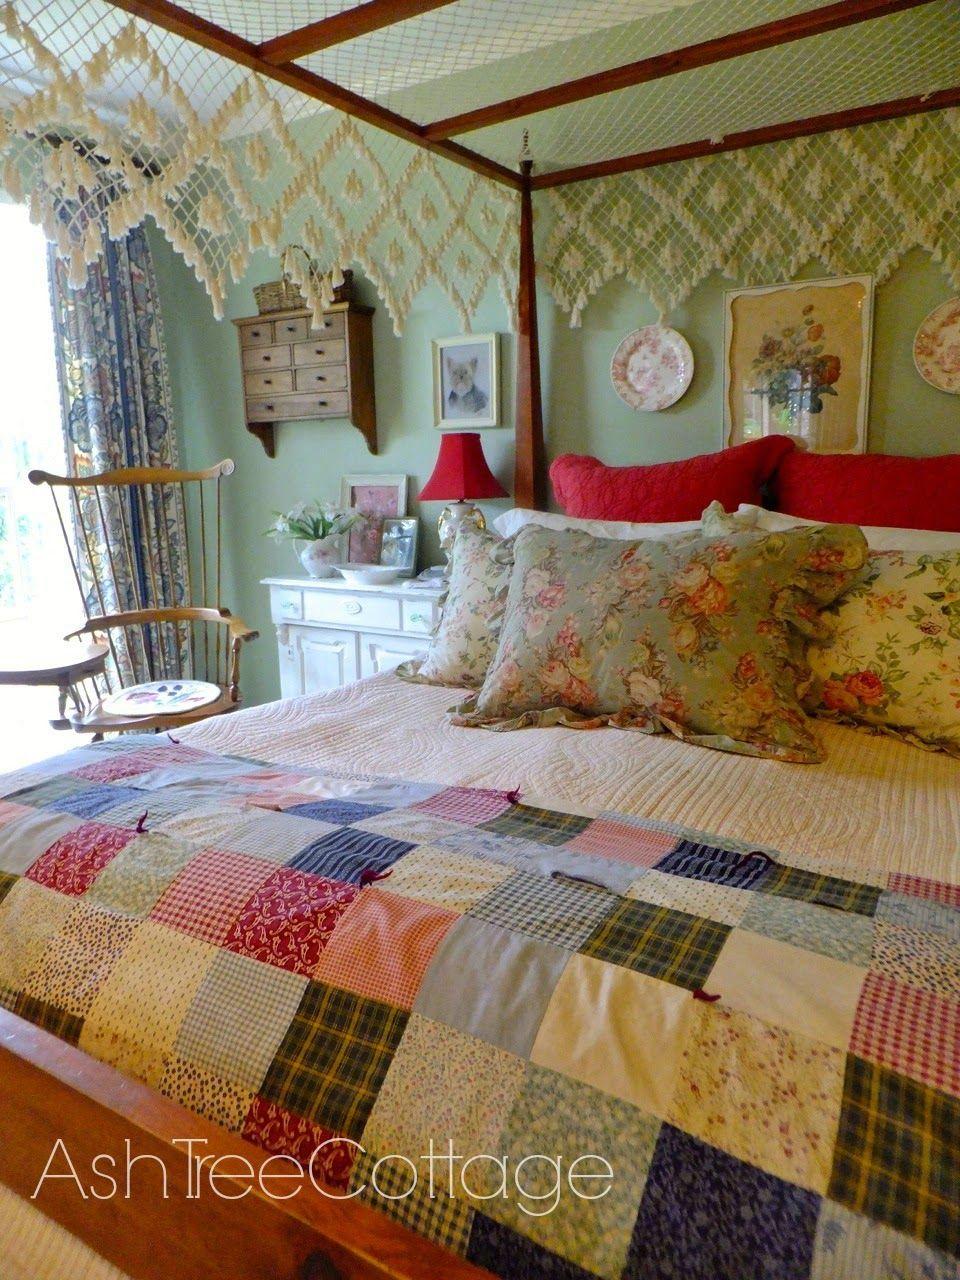 ash tree cottage let s talk granny chic victorian decor rh pinterest com country cottage quilts king size french country cottage quilts